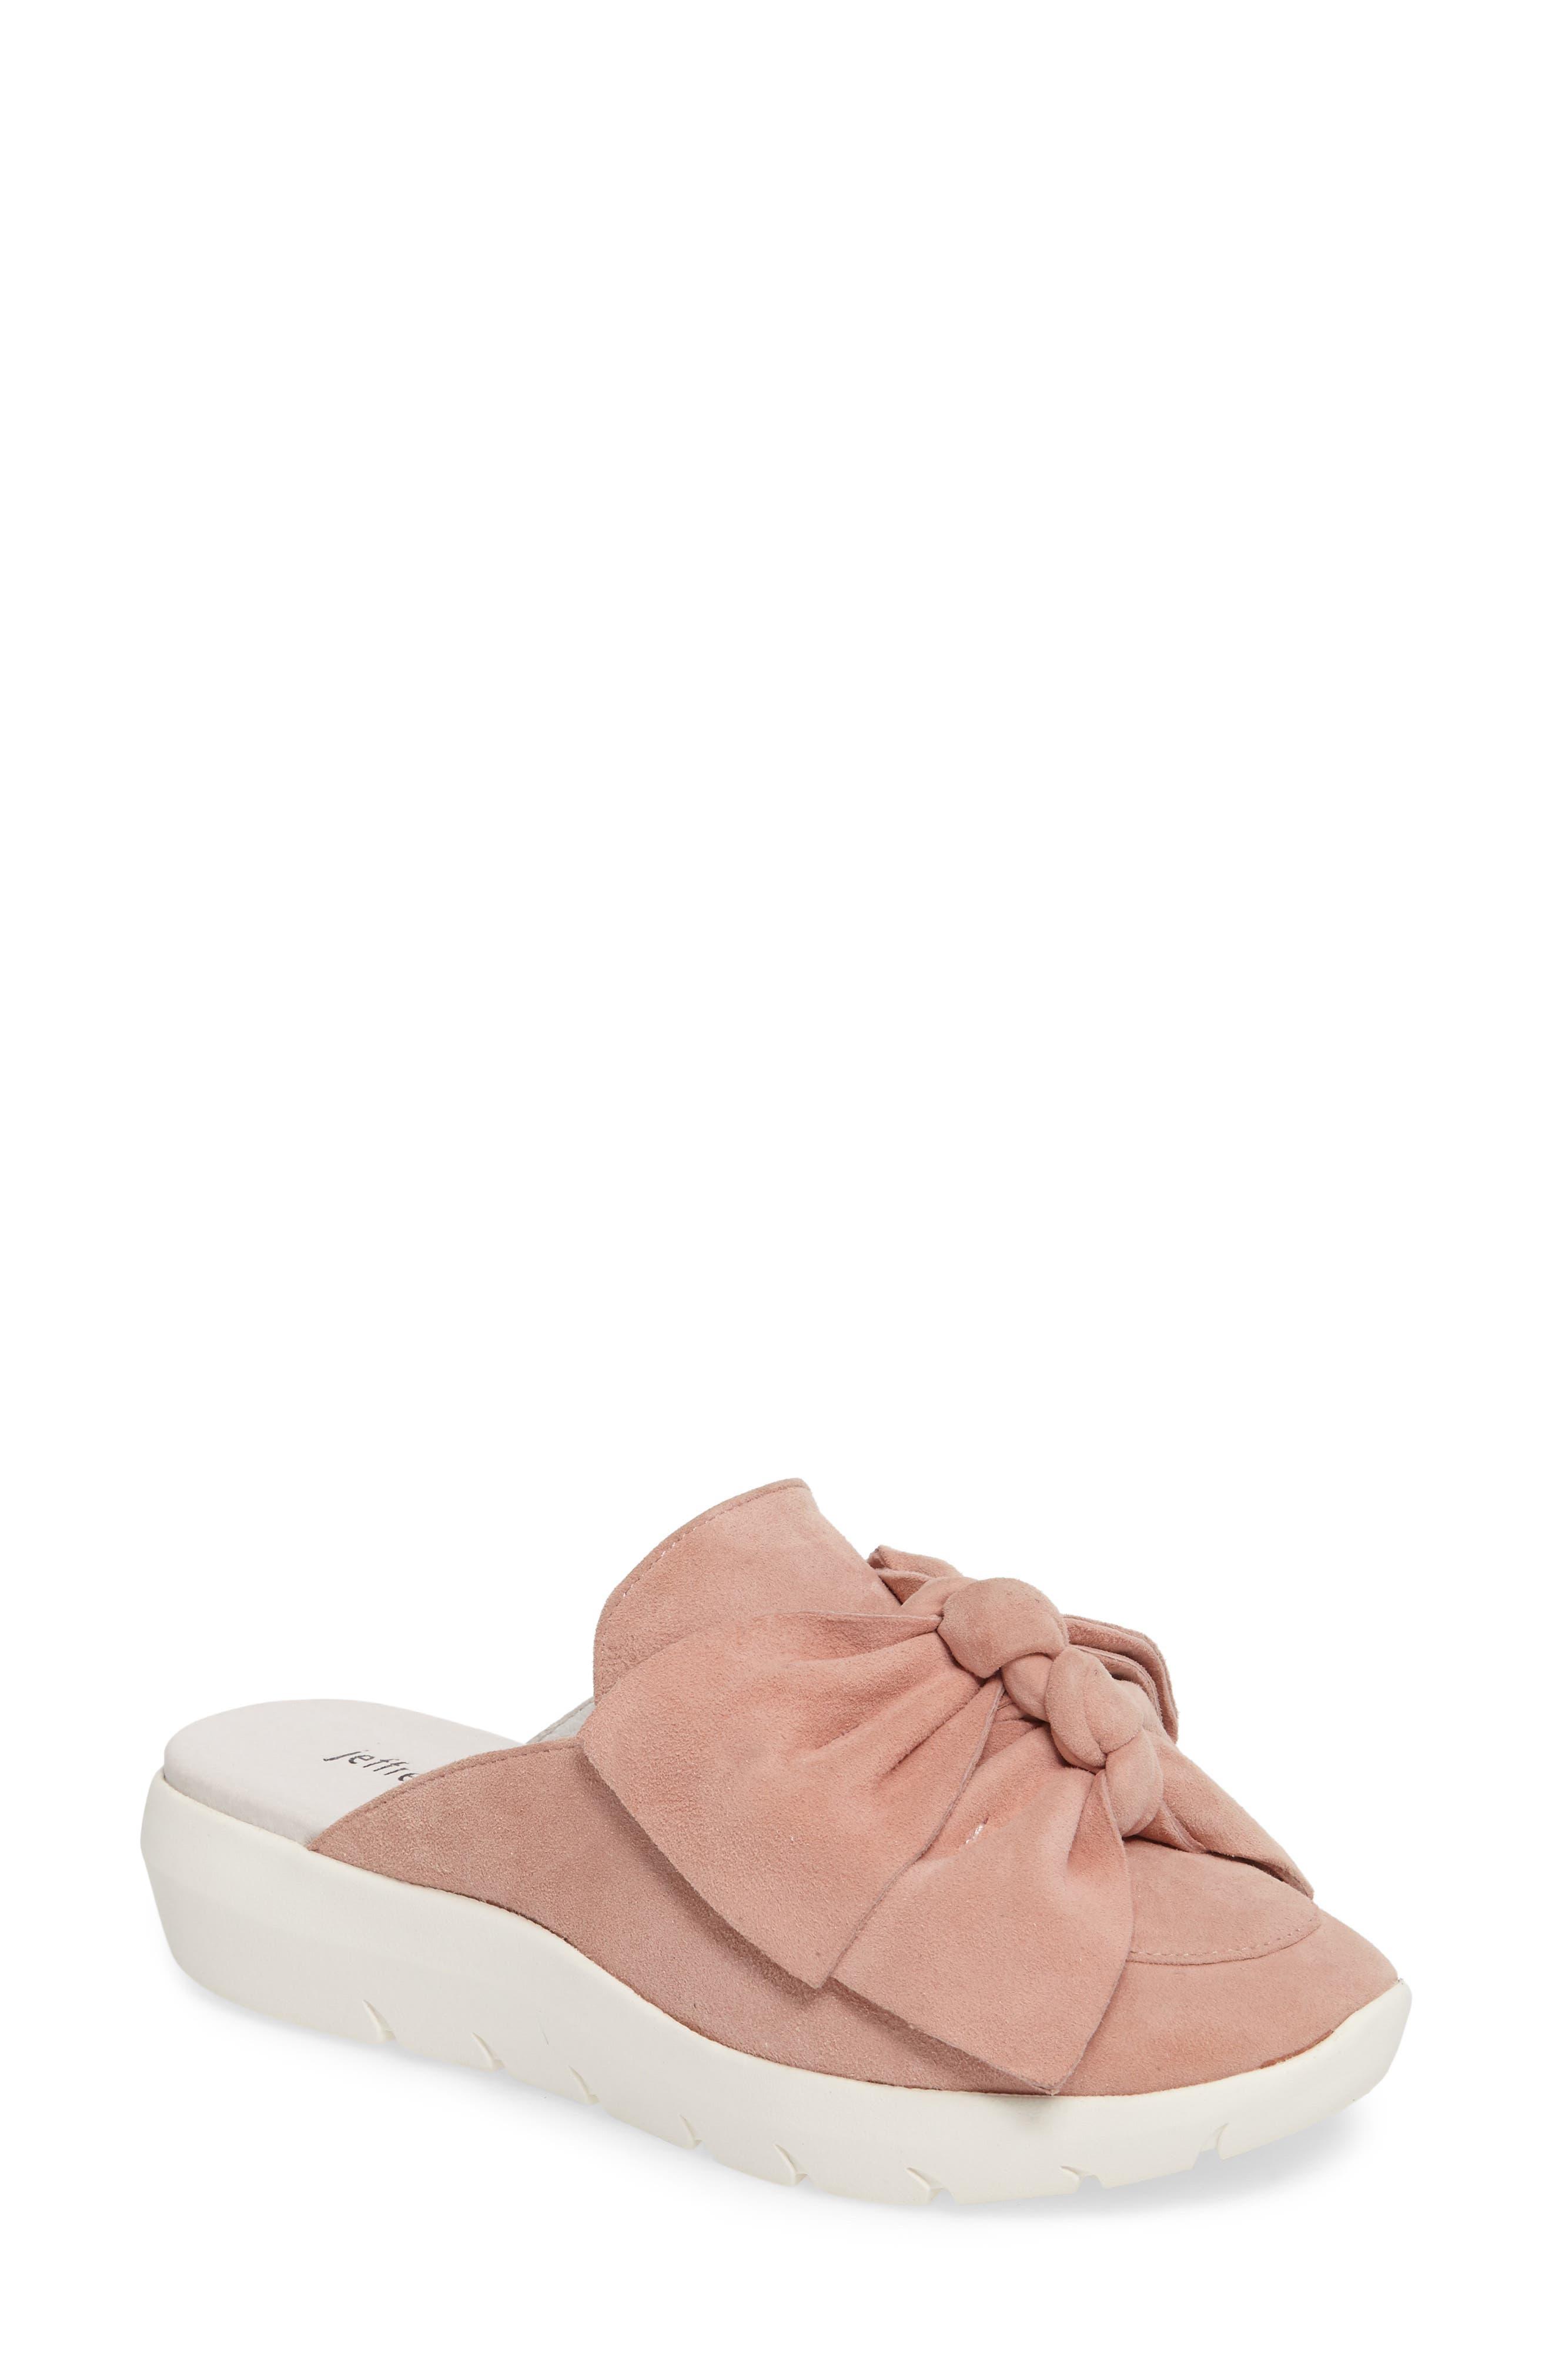 Tibow Platform Slide Sneaker,                             Main thumbnail 1, color,                             Pale Pink Suede